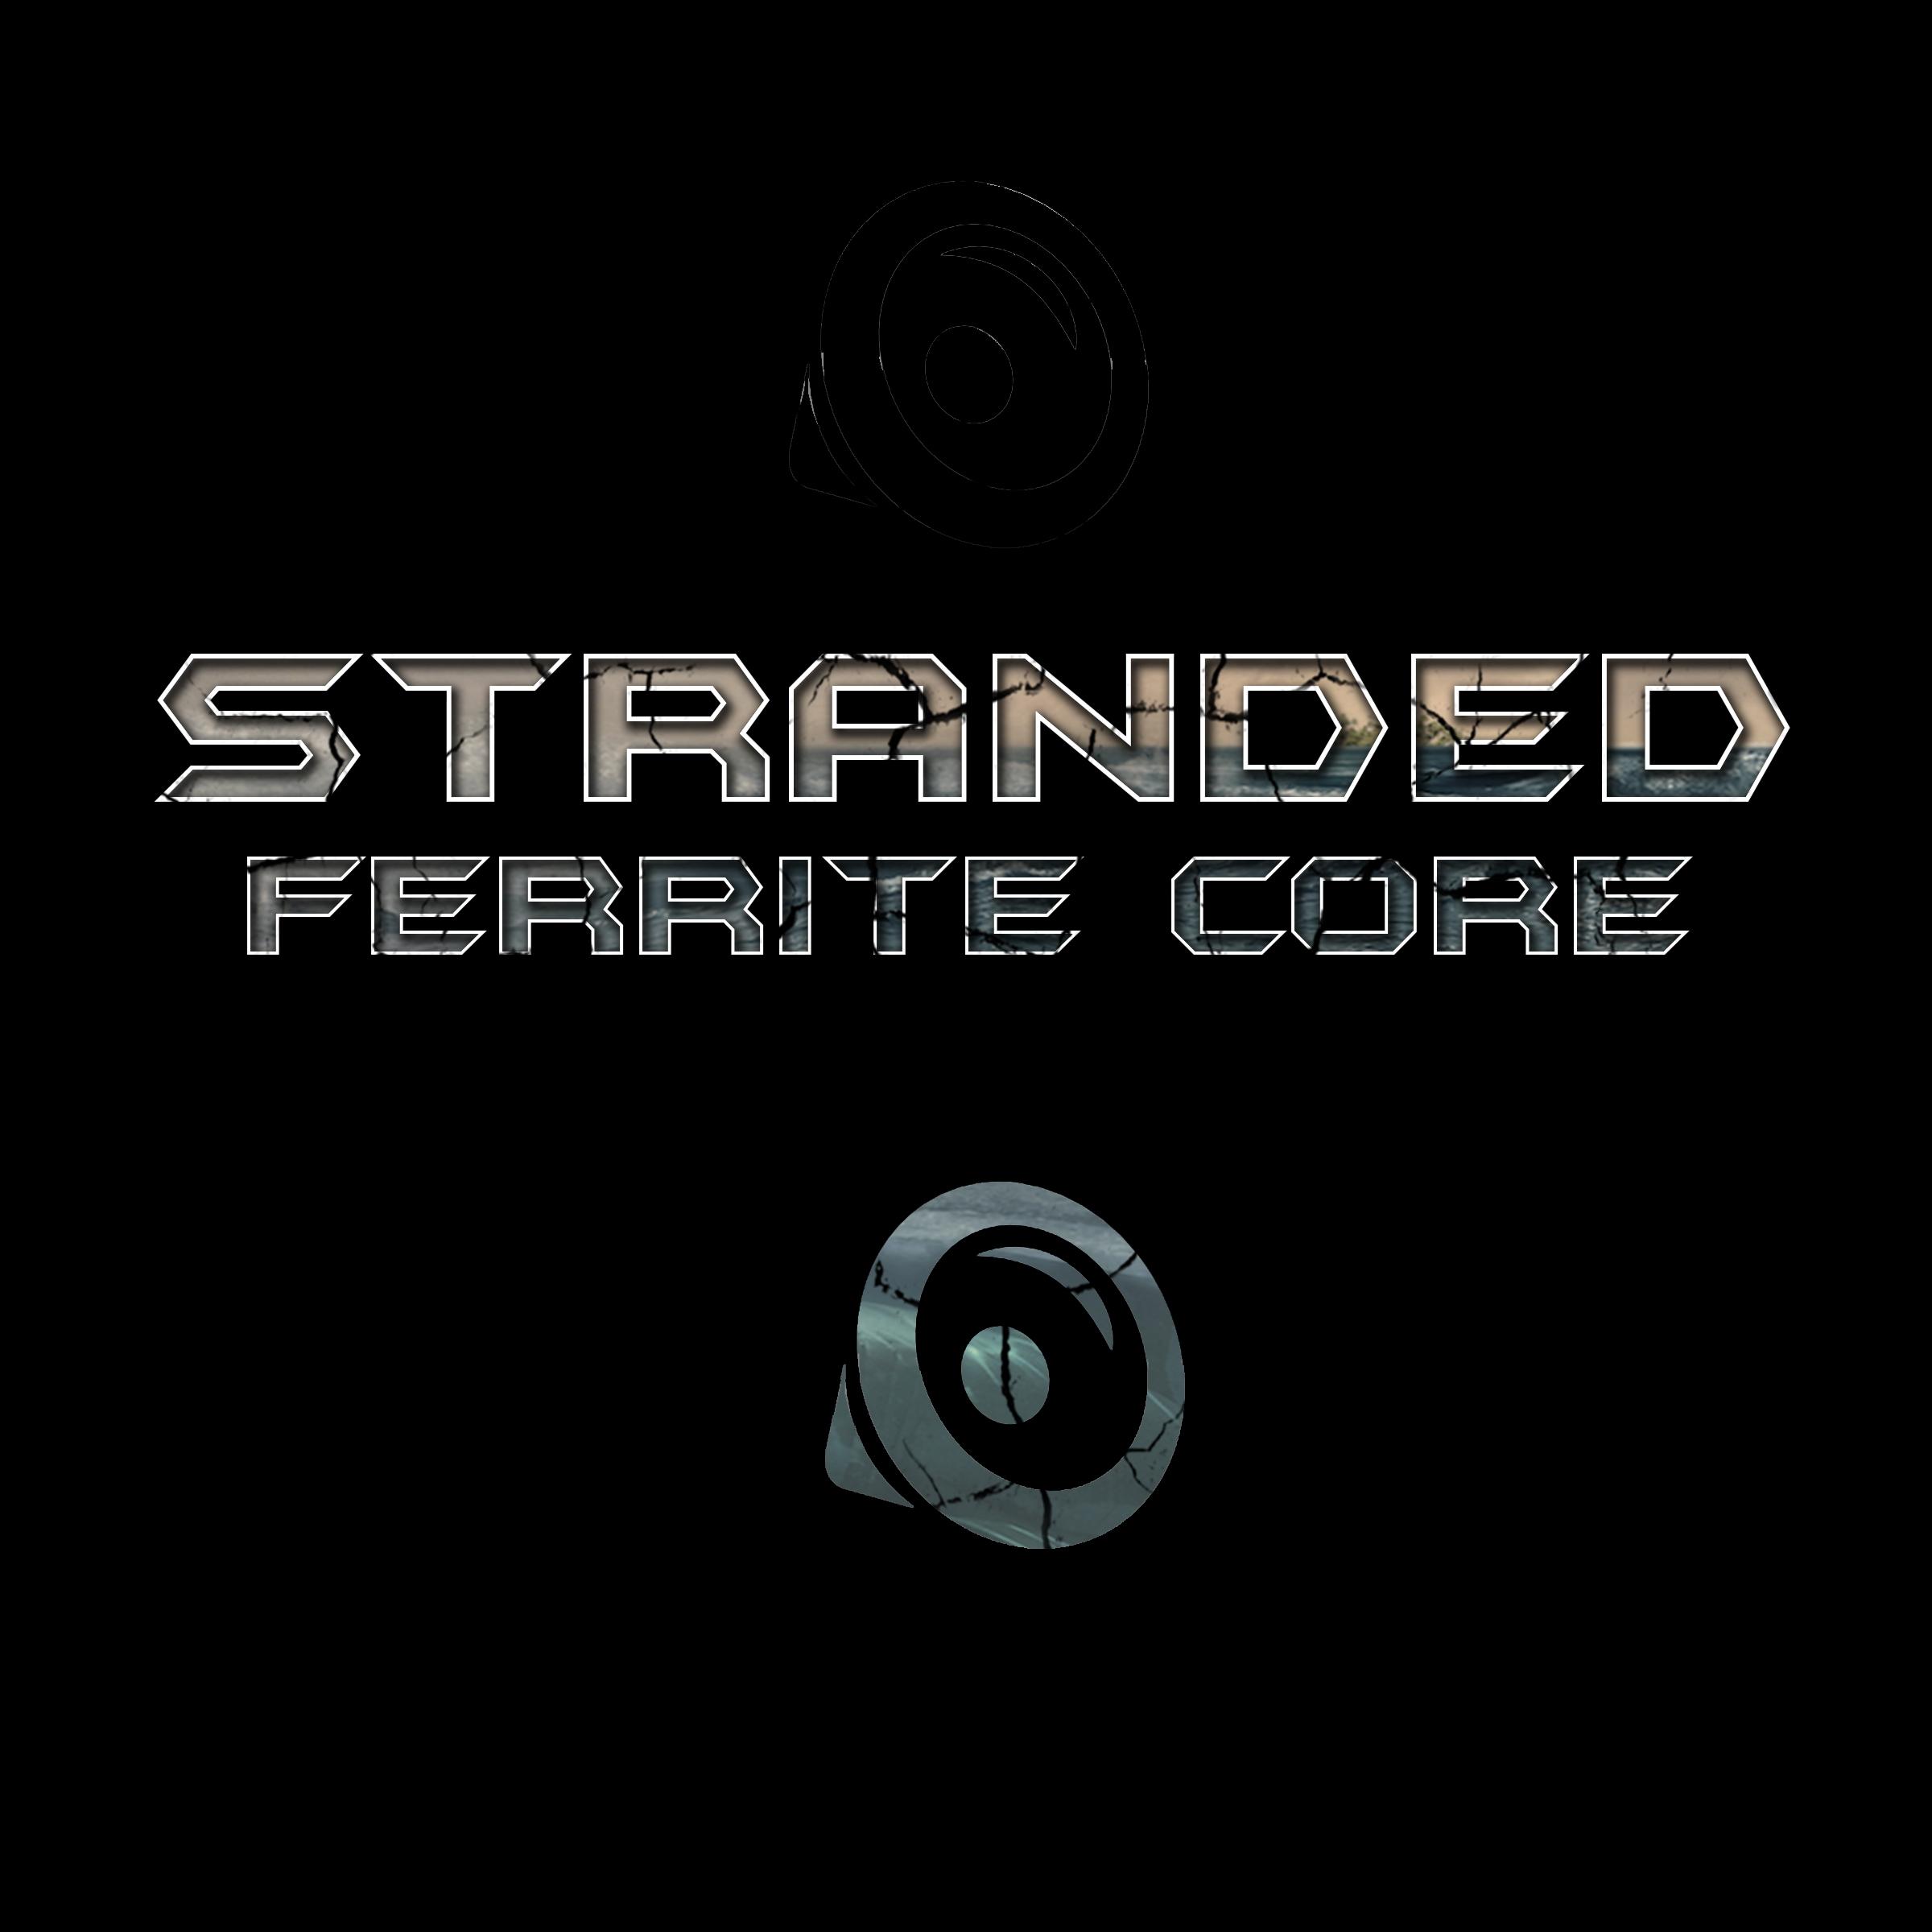 Ferrite Core - Stranded (Original Mix)